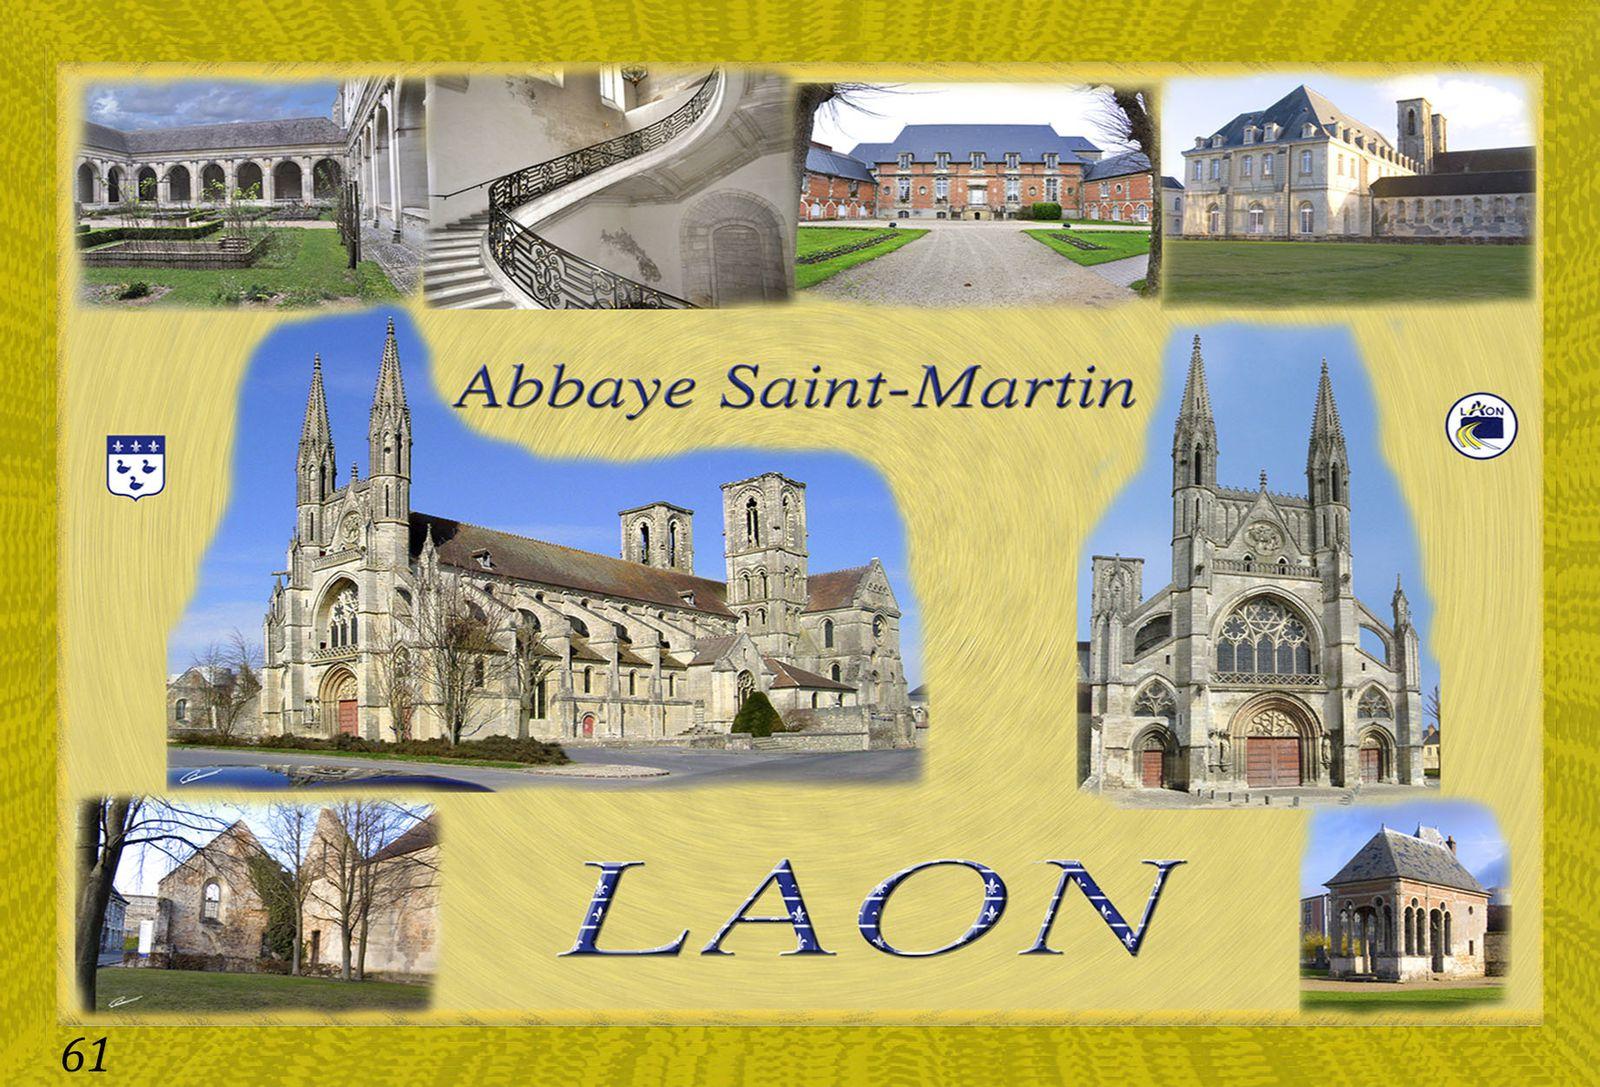 Cartes postales LAON